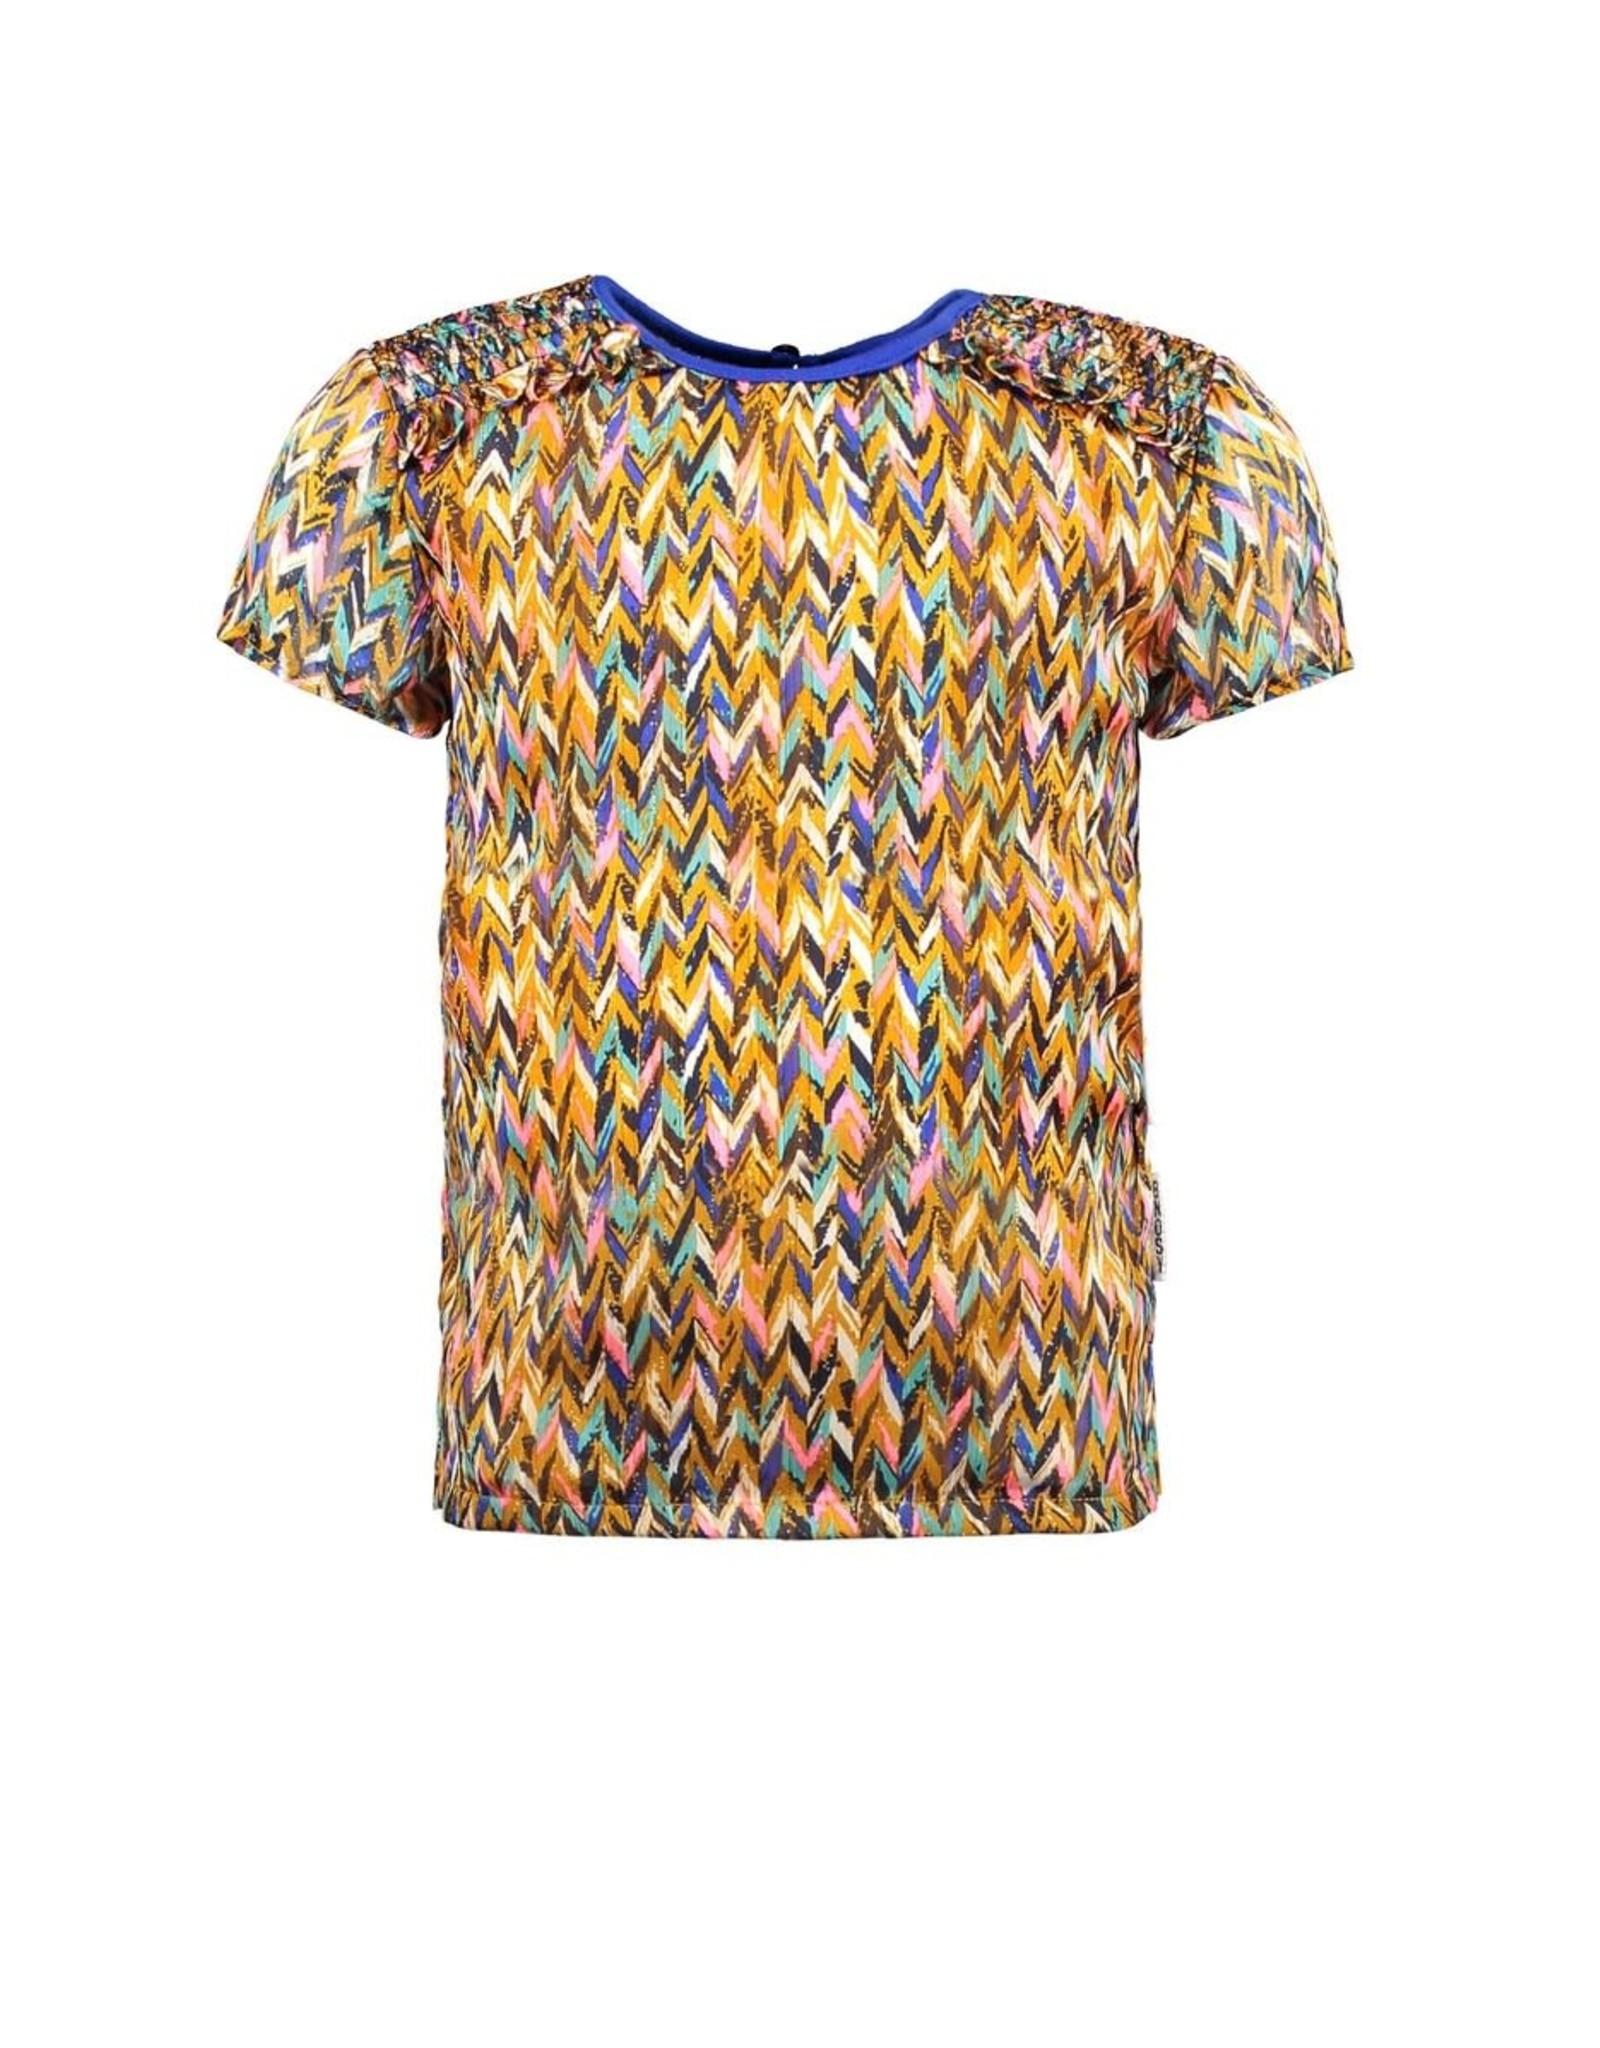 B.Nosy B.Nosy meisjes t-shirt Curious ao